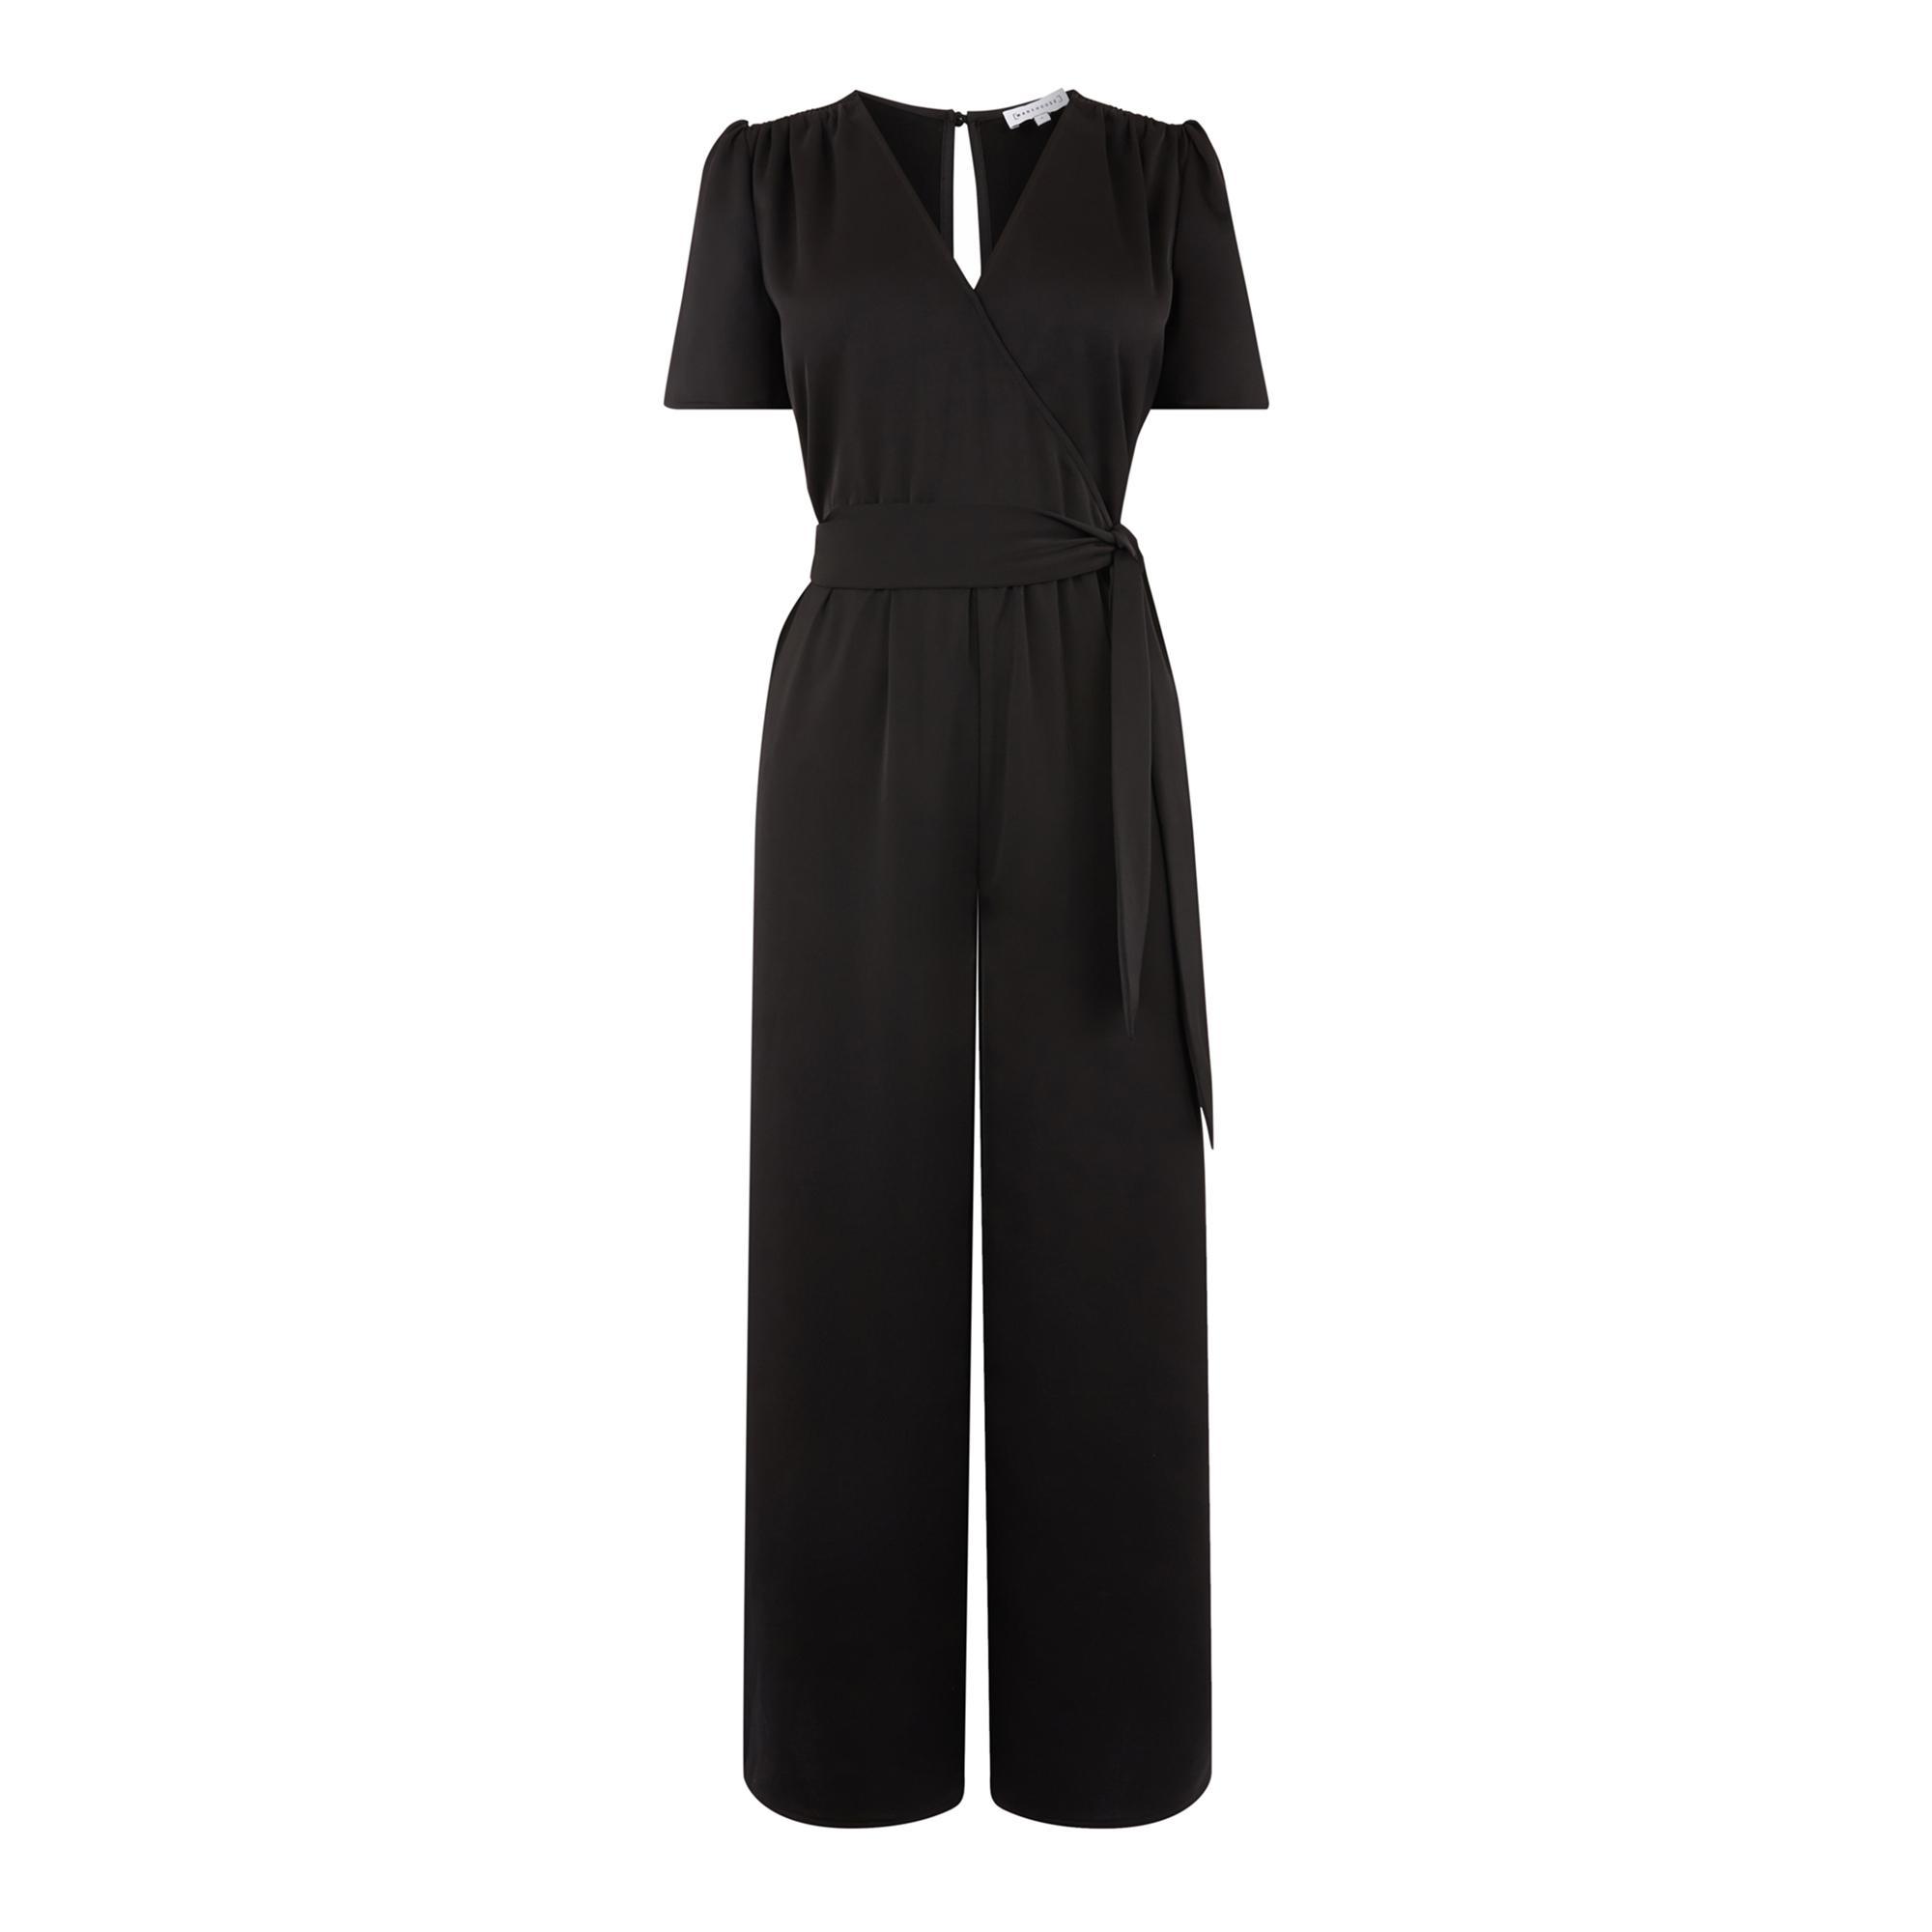 292c41c6a83a Warehouse - Black Ruched Shoulder Jumpsuit - Lyst. View fullscreen